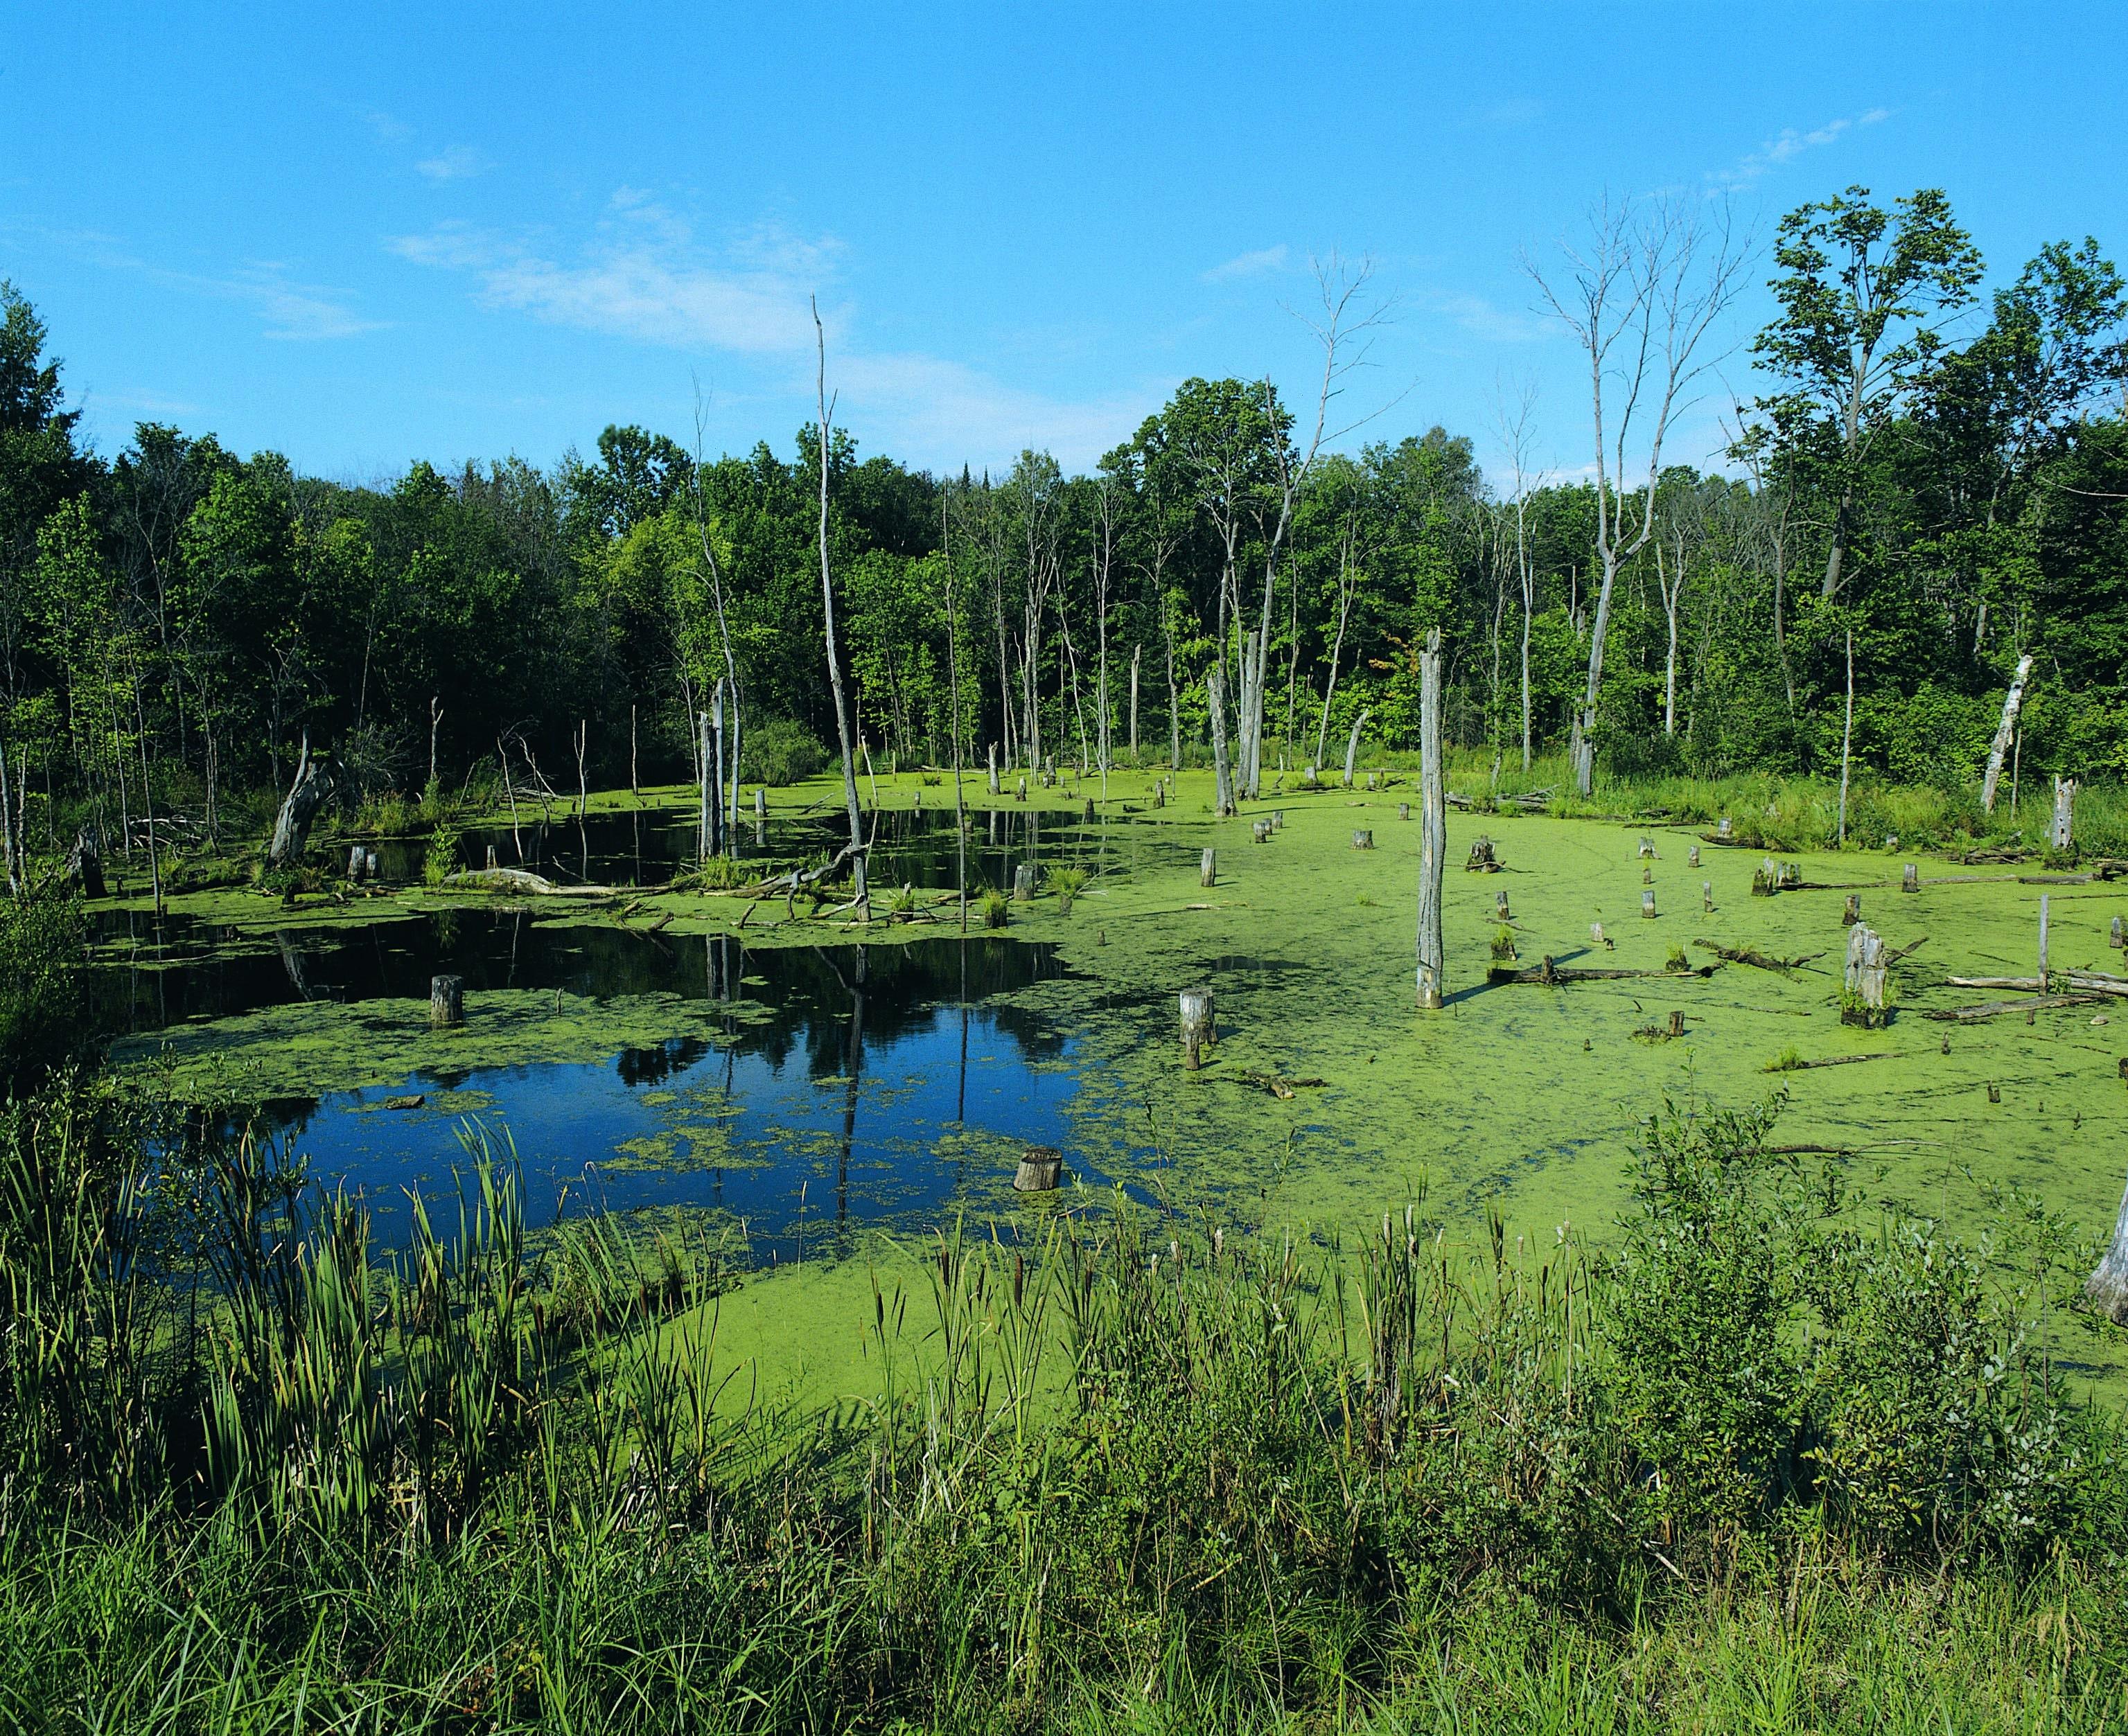 Becker County, Minnesota, United States of America